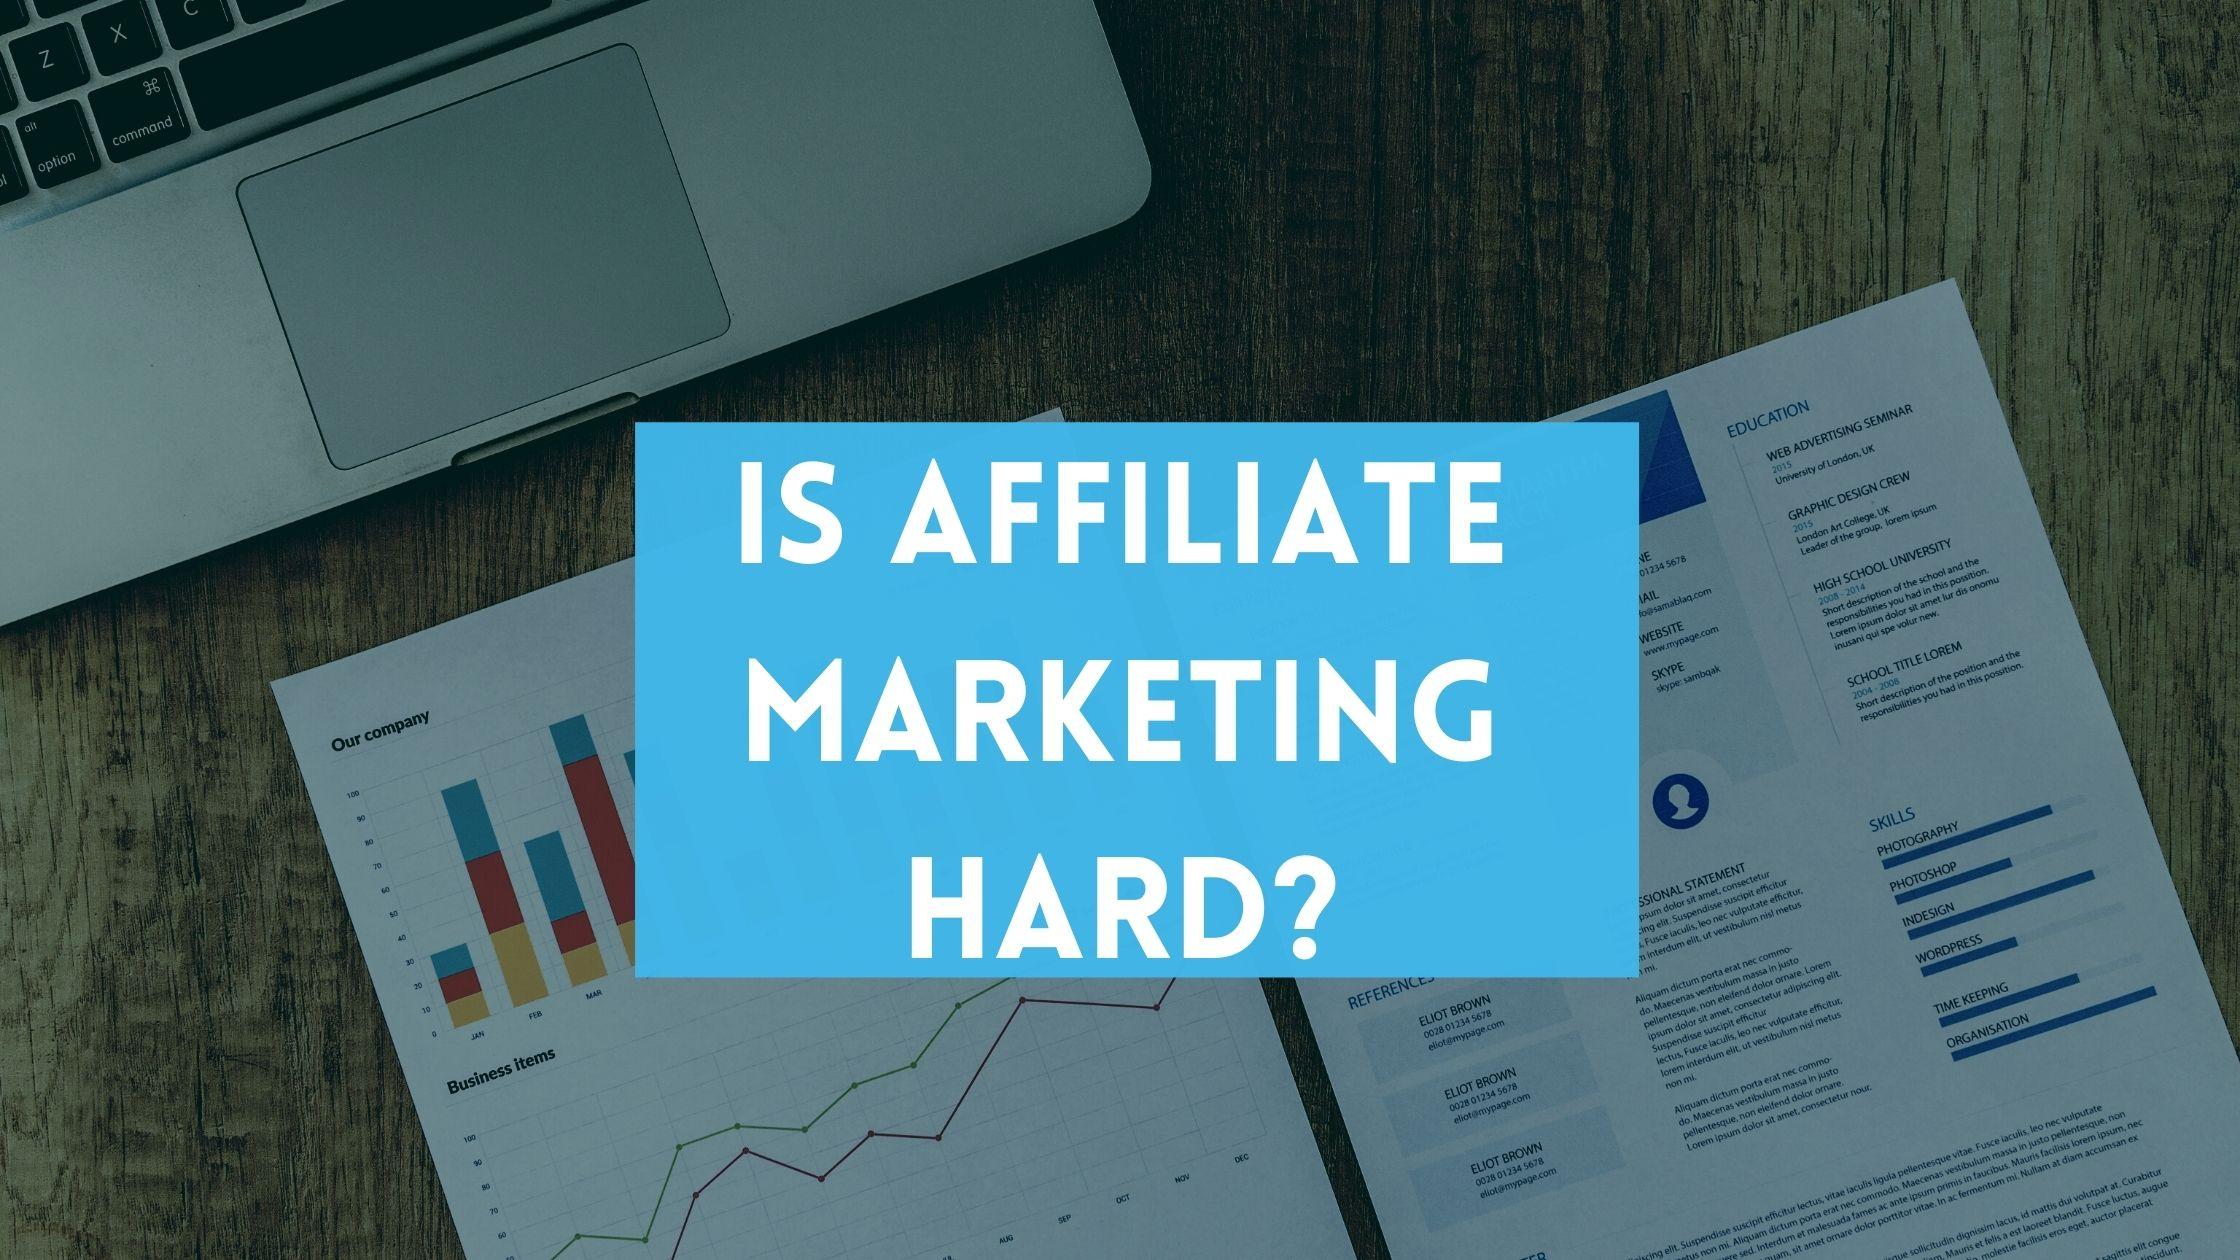 Is affiliate marketing hard